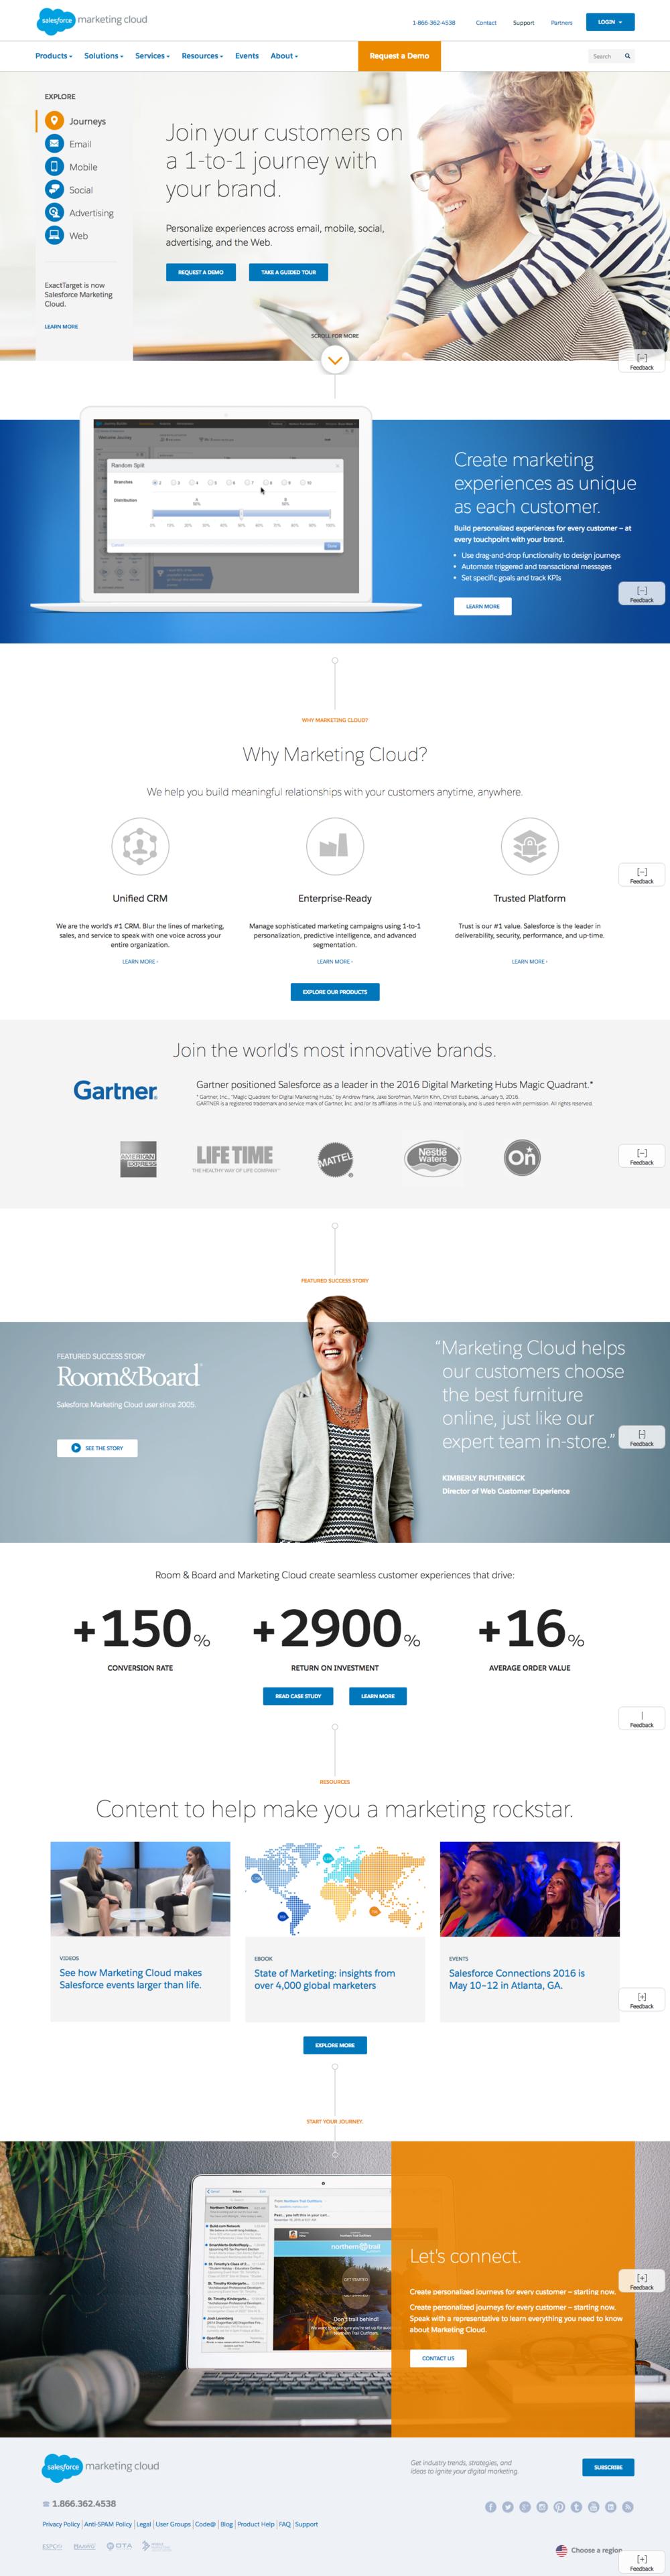 Marketingcloud.com